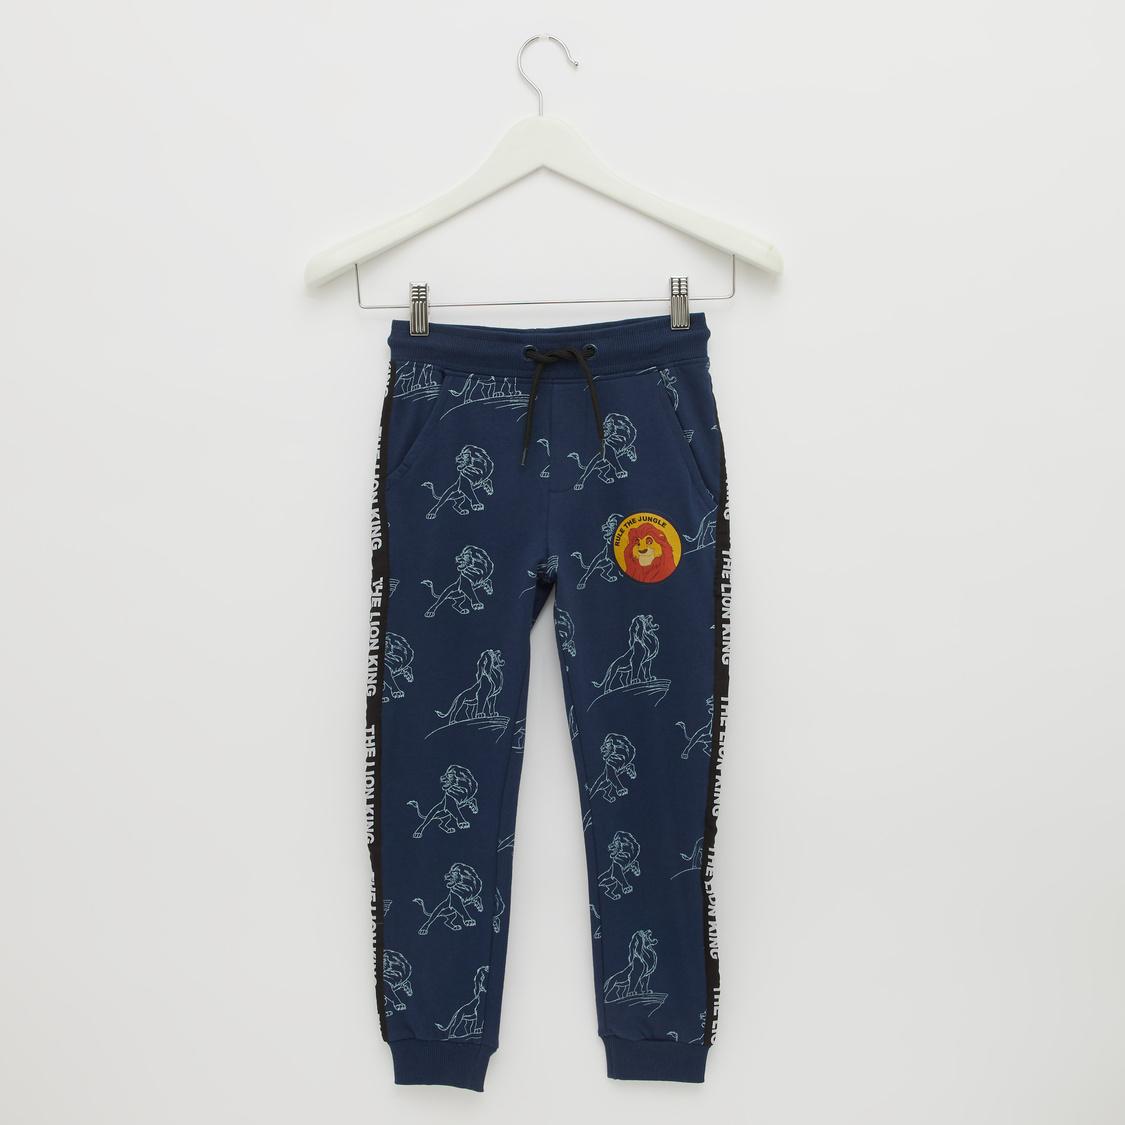 The Lion King Print Jog Pants with Pocket Detail and Drawstring